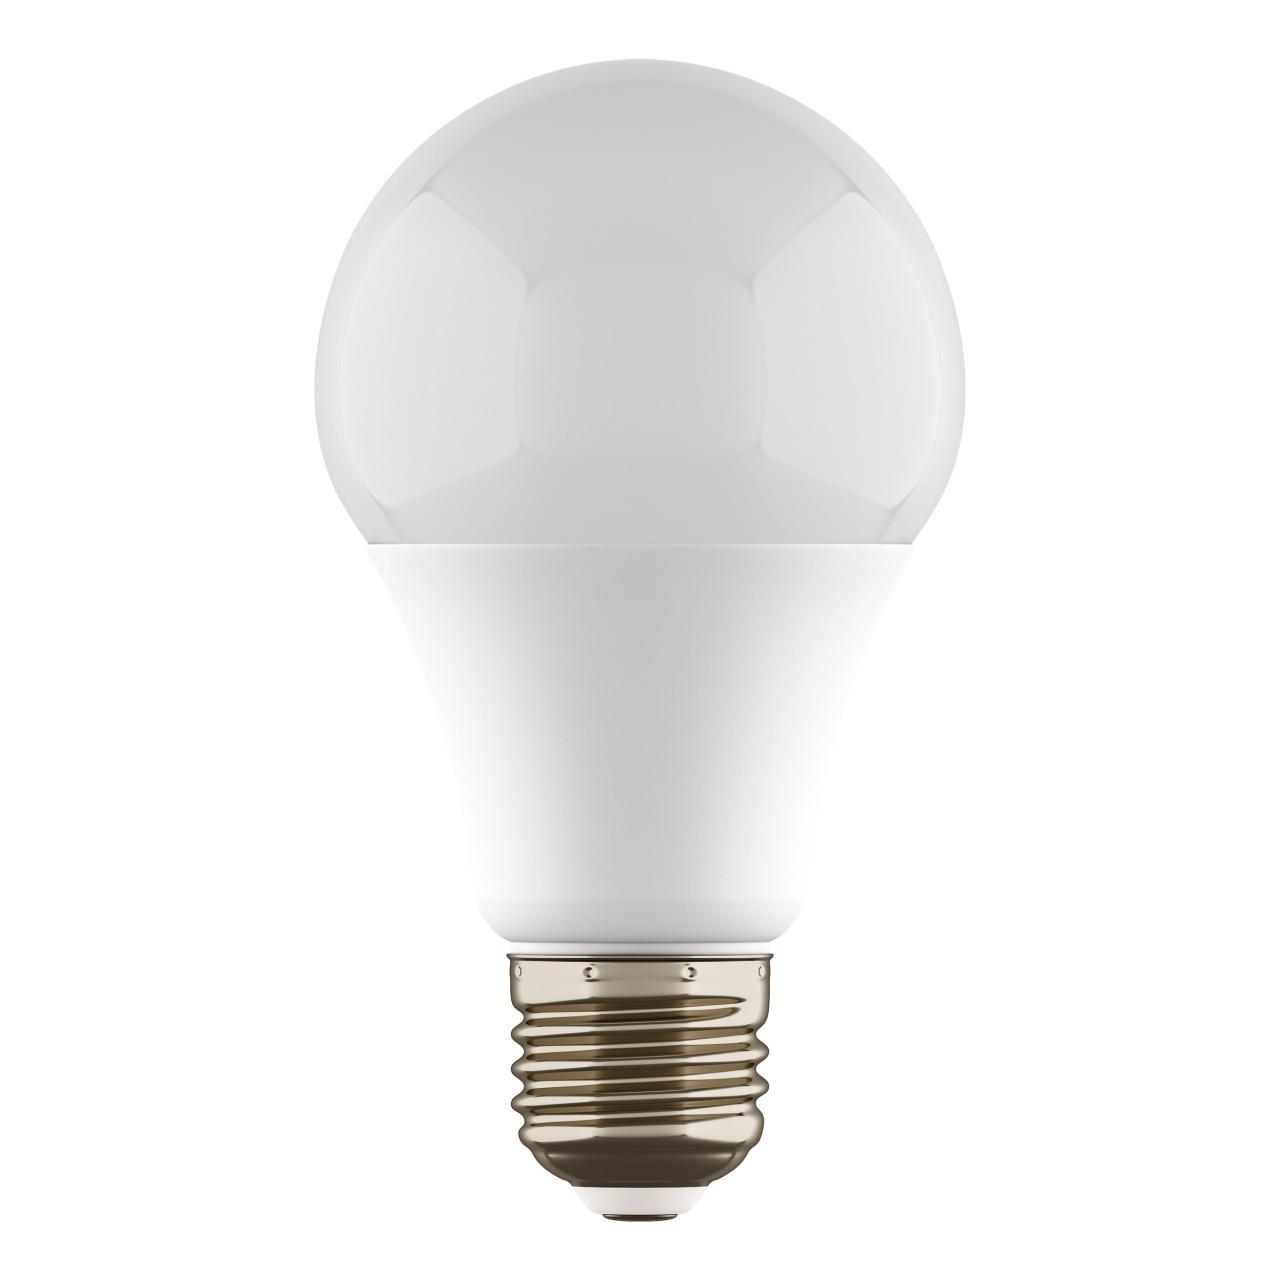 Лампа LED 220V A60 E27 9W=90W 600LM 180G FR 3000K 20000H Lightstar 940002